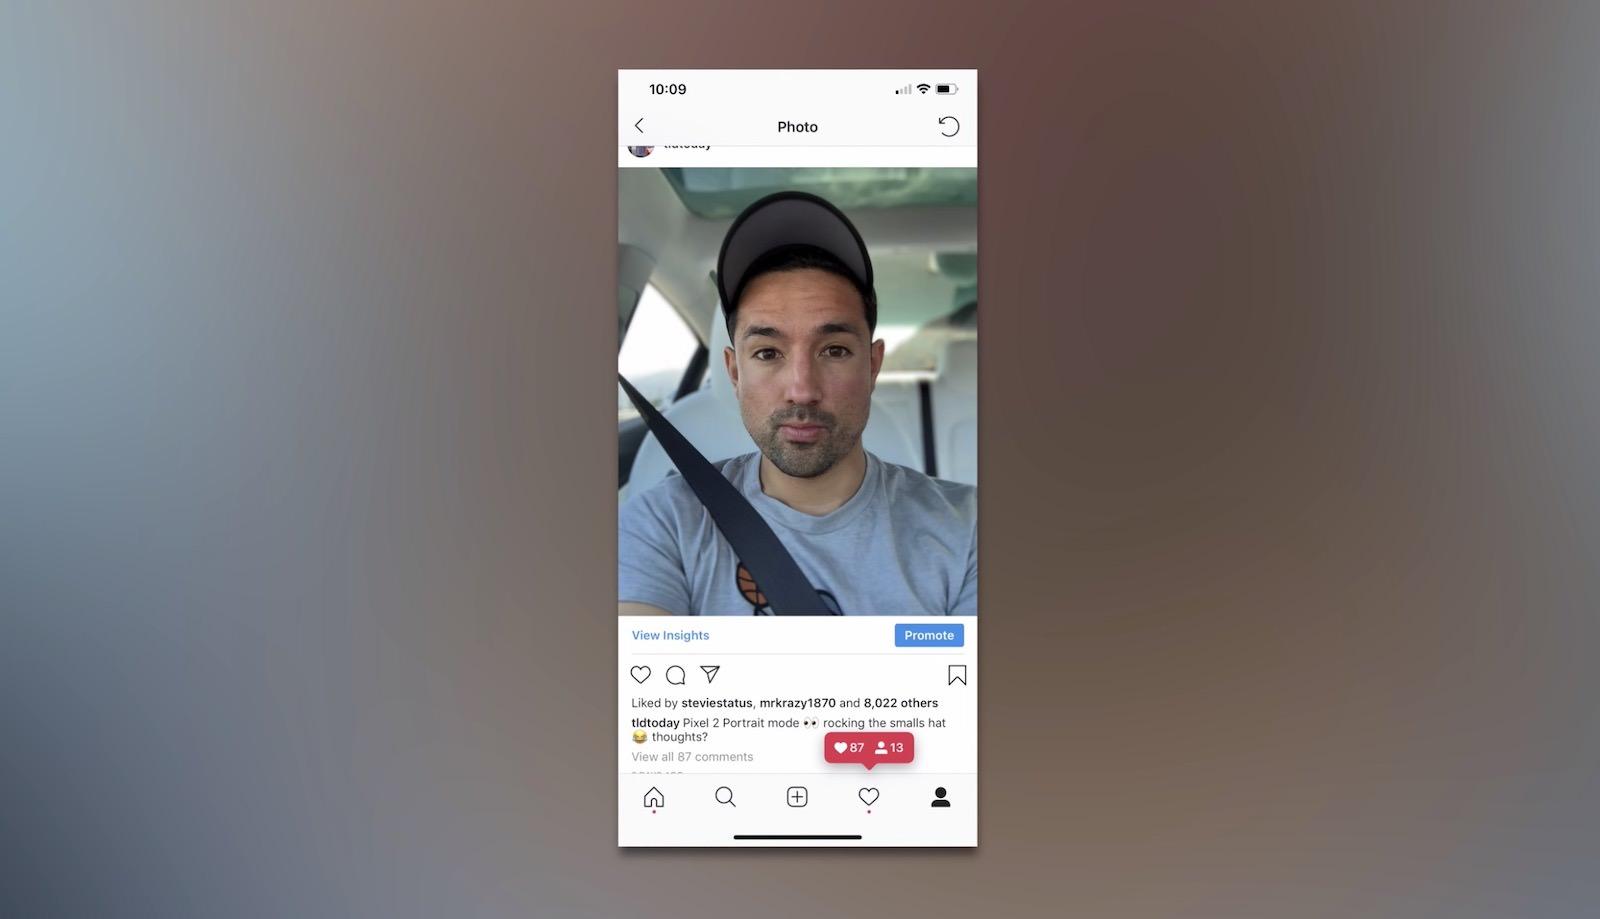 jonathan morrison selfie